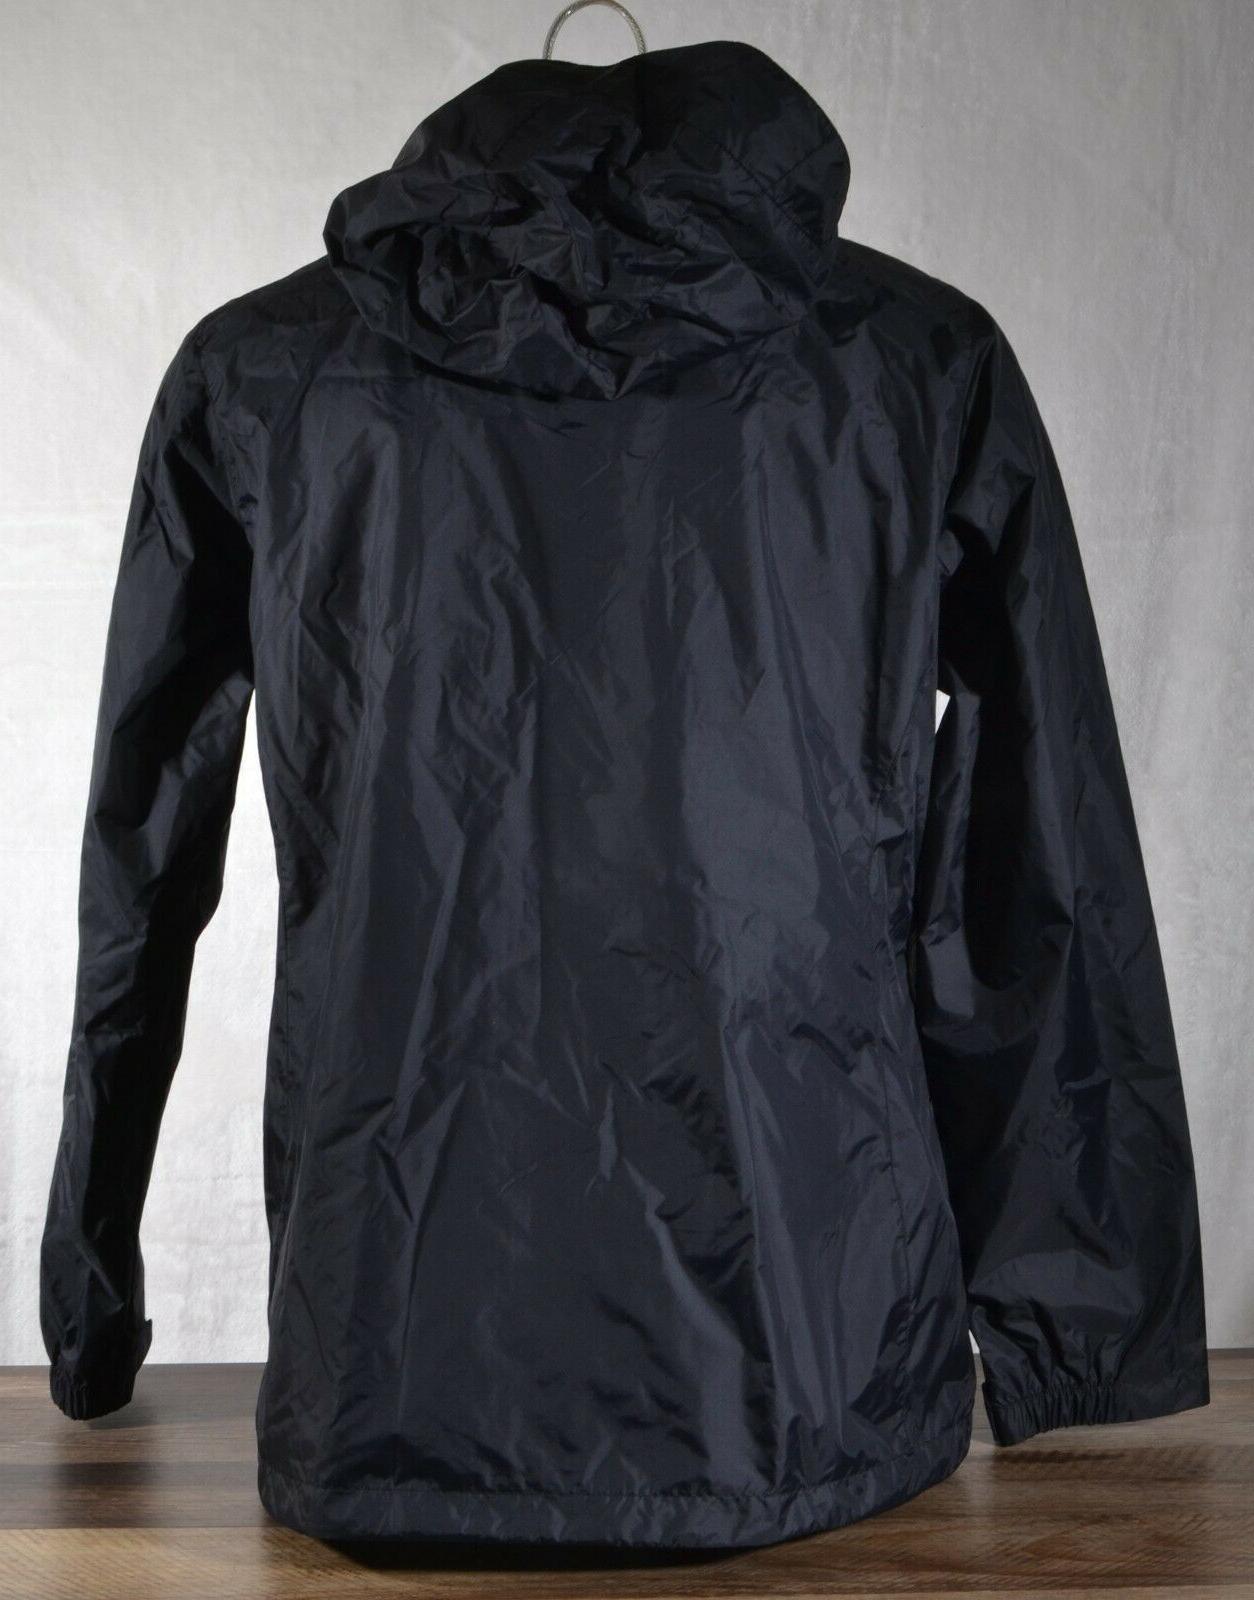 NWT Columbia Woman's Rain Jacket Variety